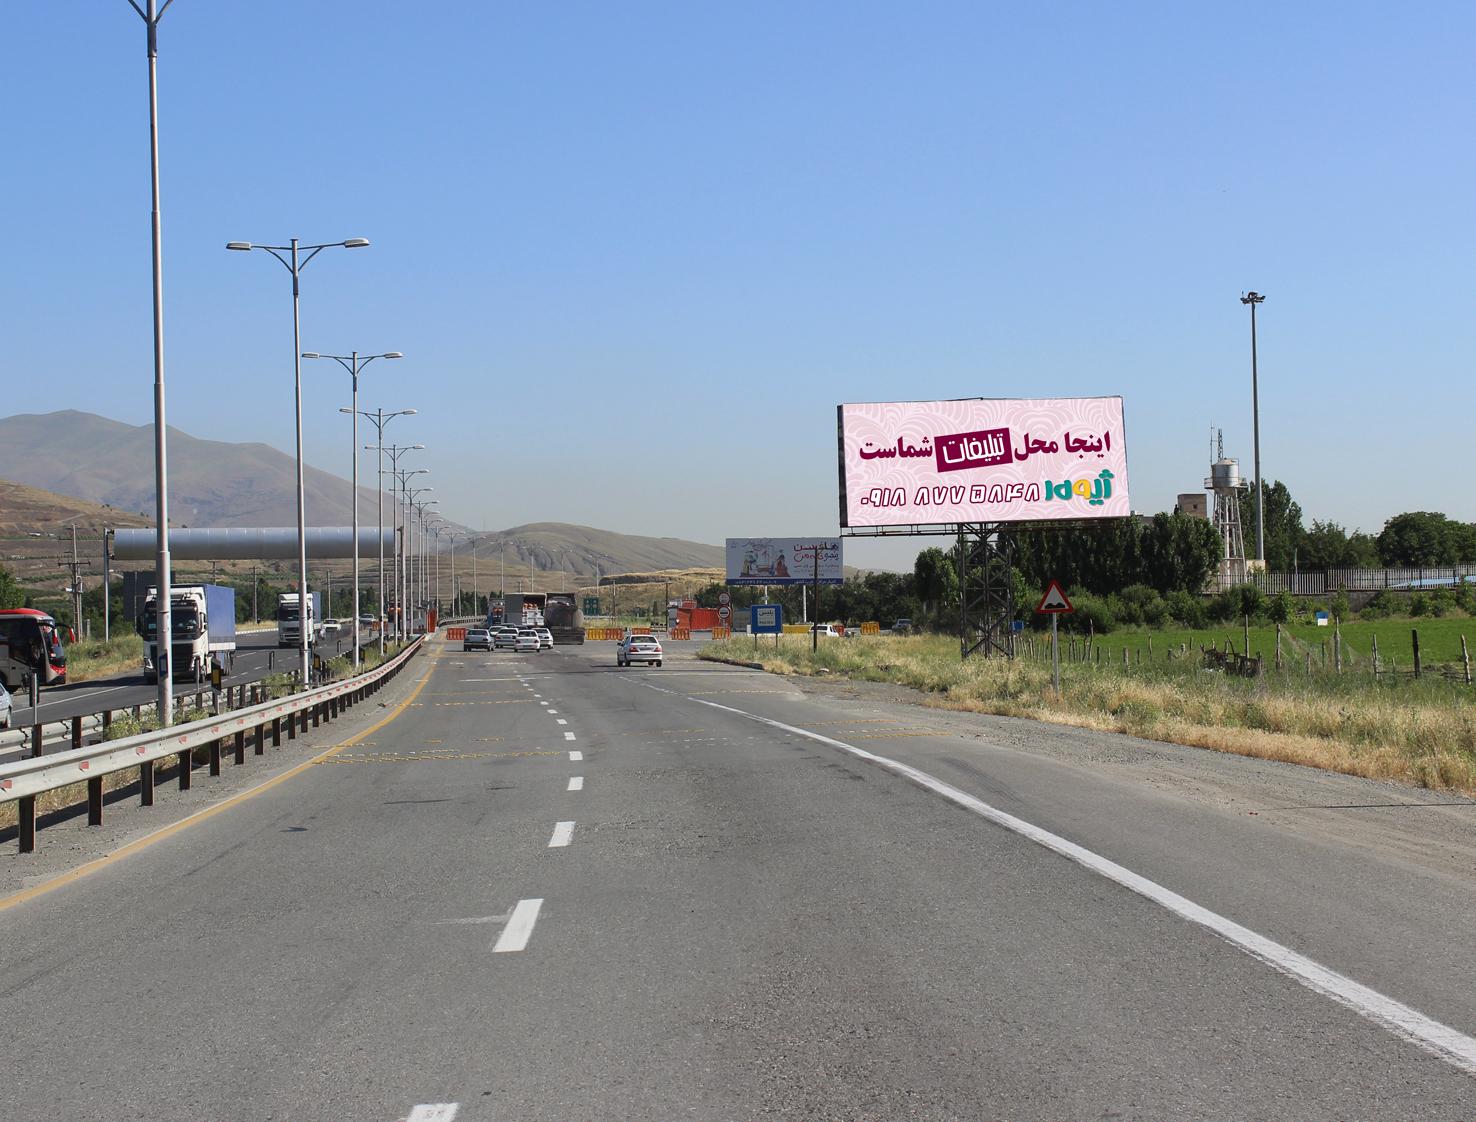 بیلبورد تبلیغاتی محور کرمانشاه ، سنندج جنب پلیس راه